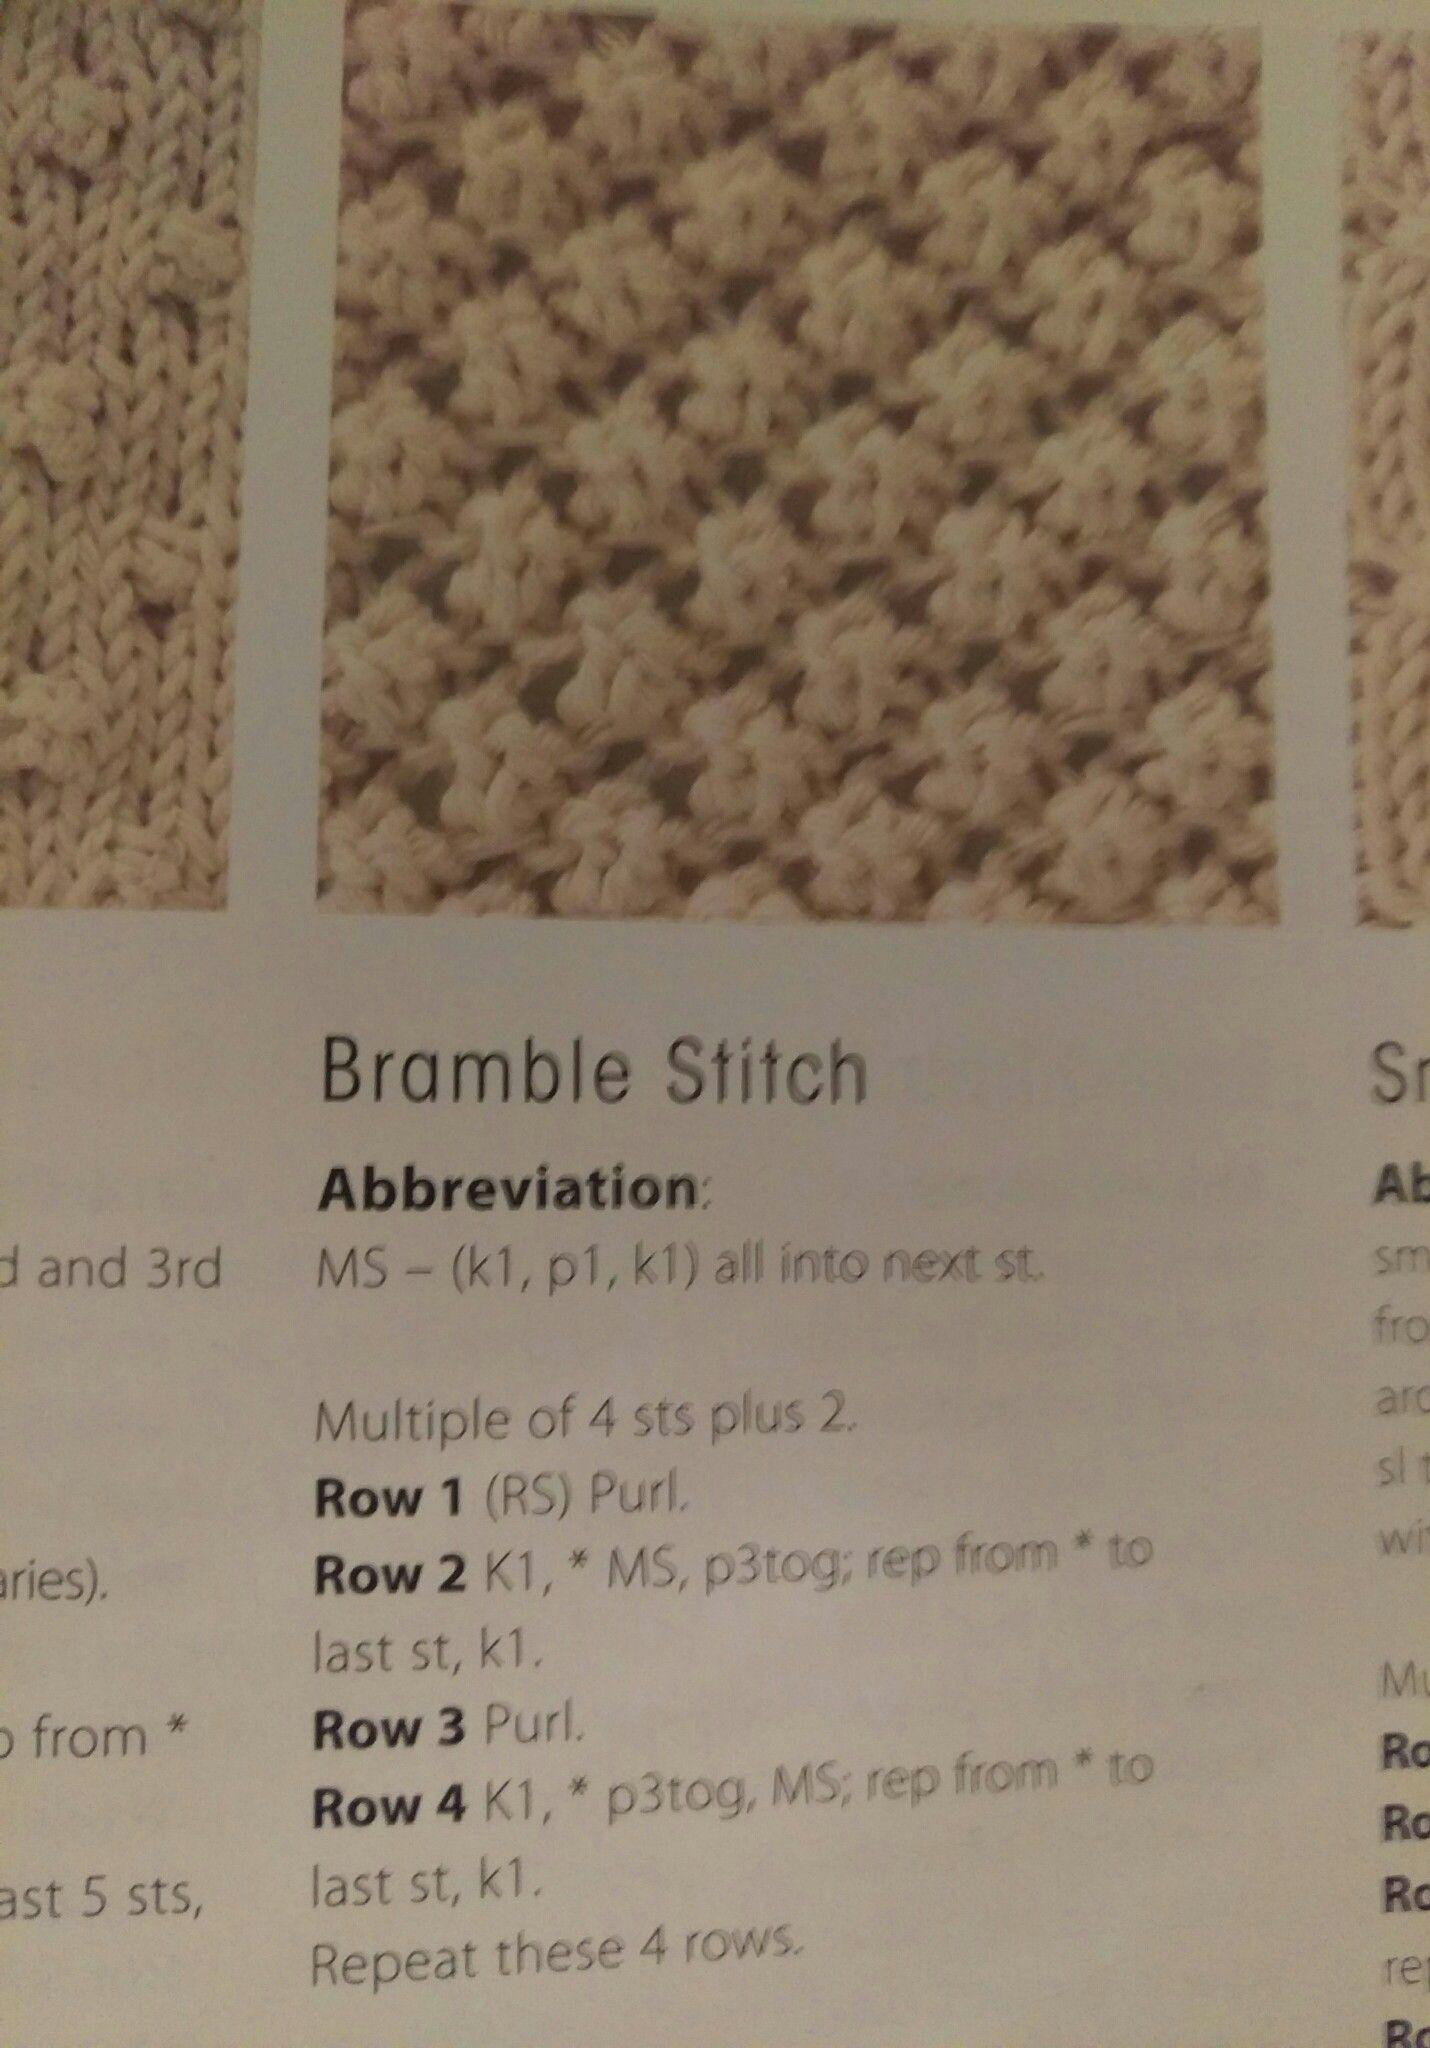 Bramble stitch | Knittingcroche | Knitting stitches